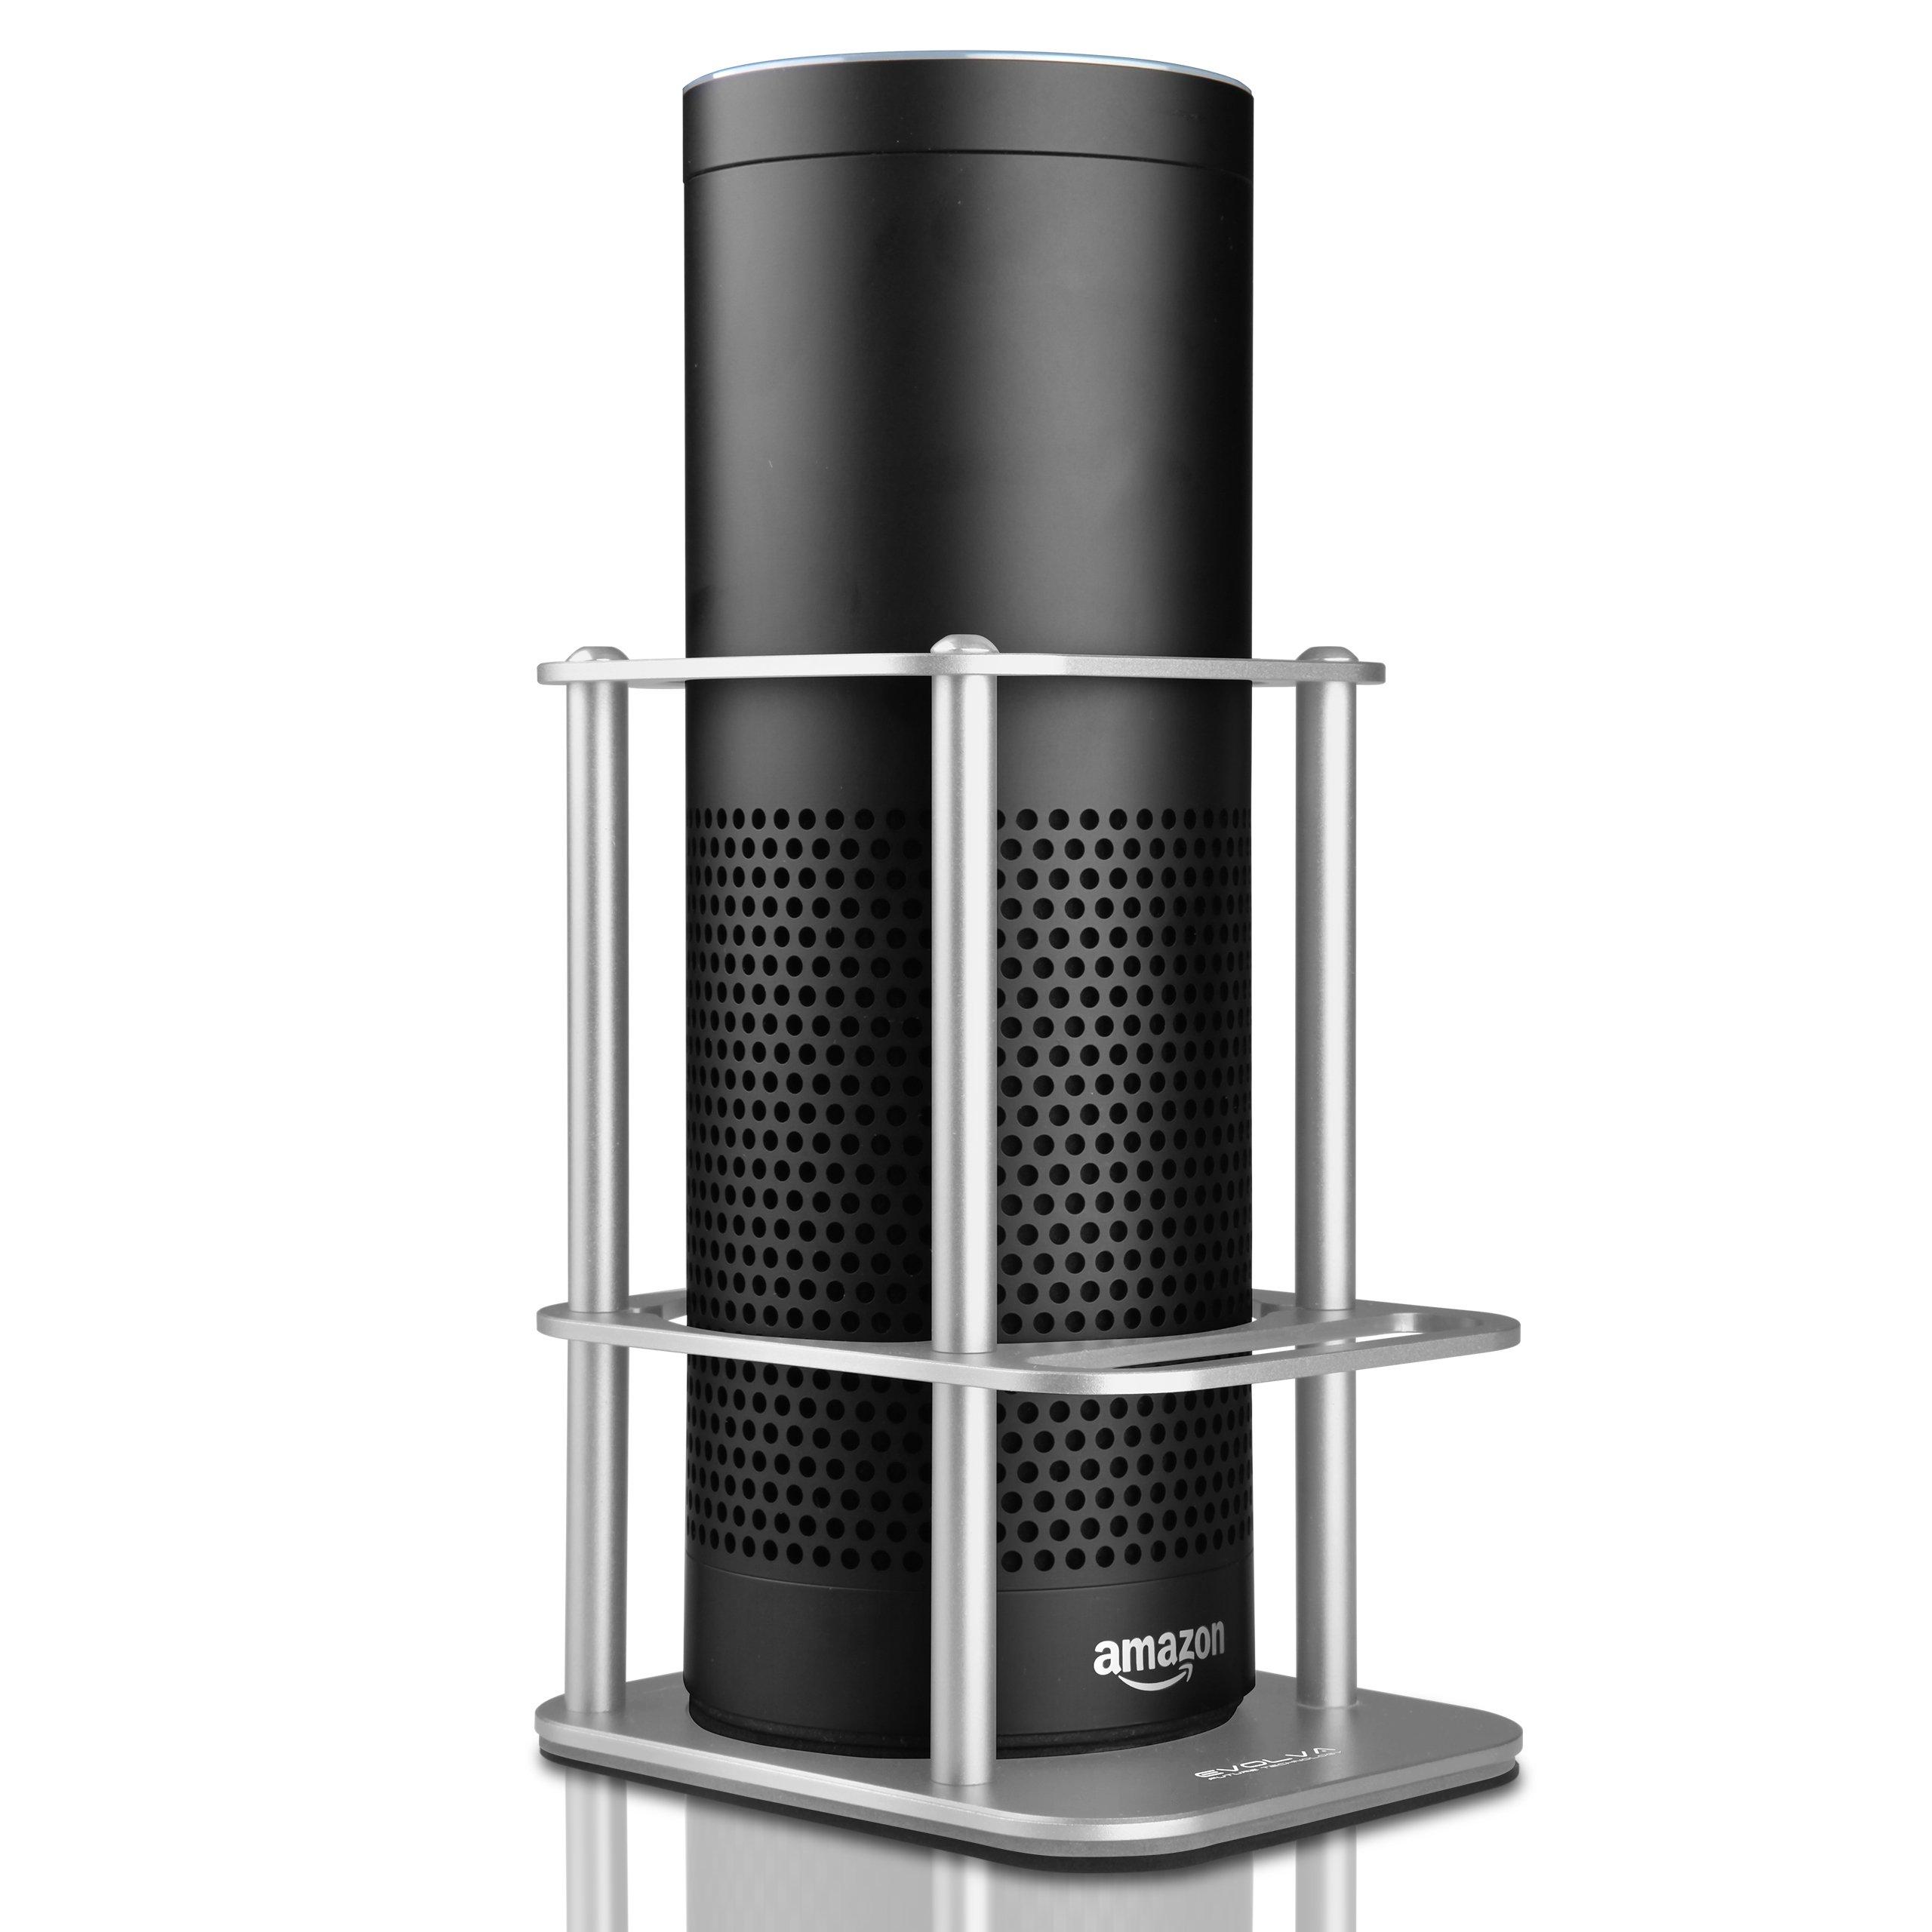 Aluminium Speaker Guard, Sturdy and High Quality, Evolva Future Technology Speaker Stand For Amazon Echo and UE MEGABOOM, Safe Guard Holder for your Alexa, Pen, Alexa Remote, Mobile Phone(Signature Silver)